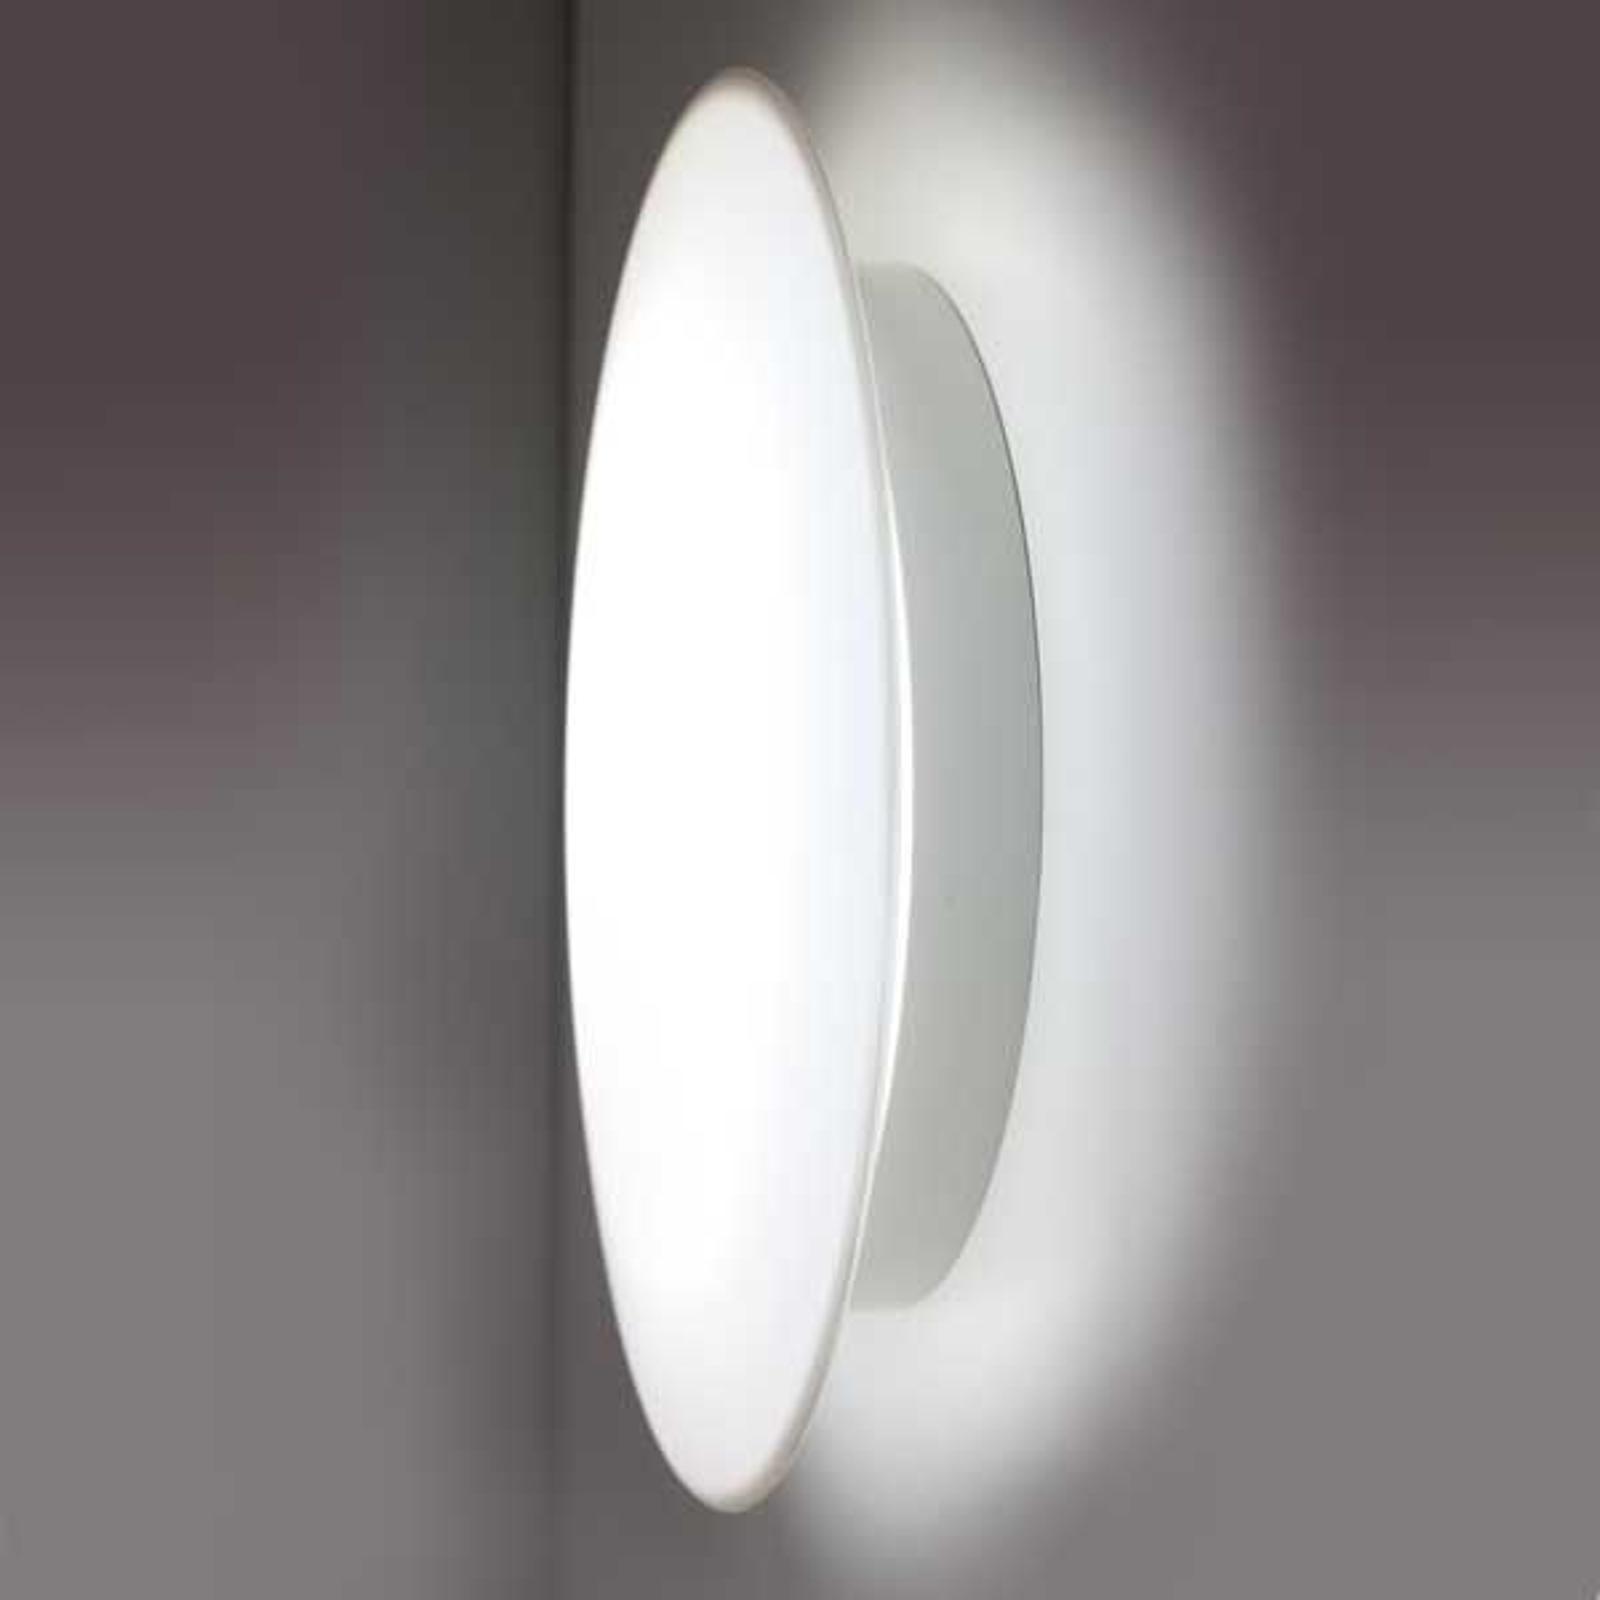 LED-Wandleuchte Sun 3 aus Kunststoff 3.000K 8W